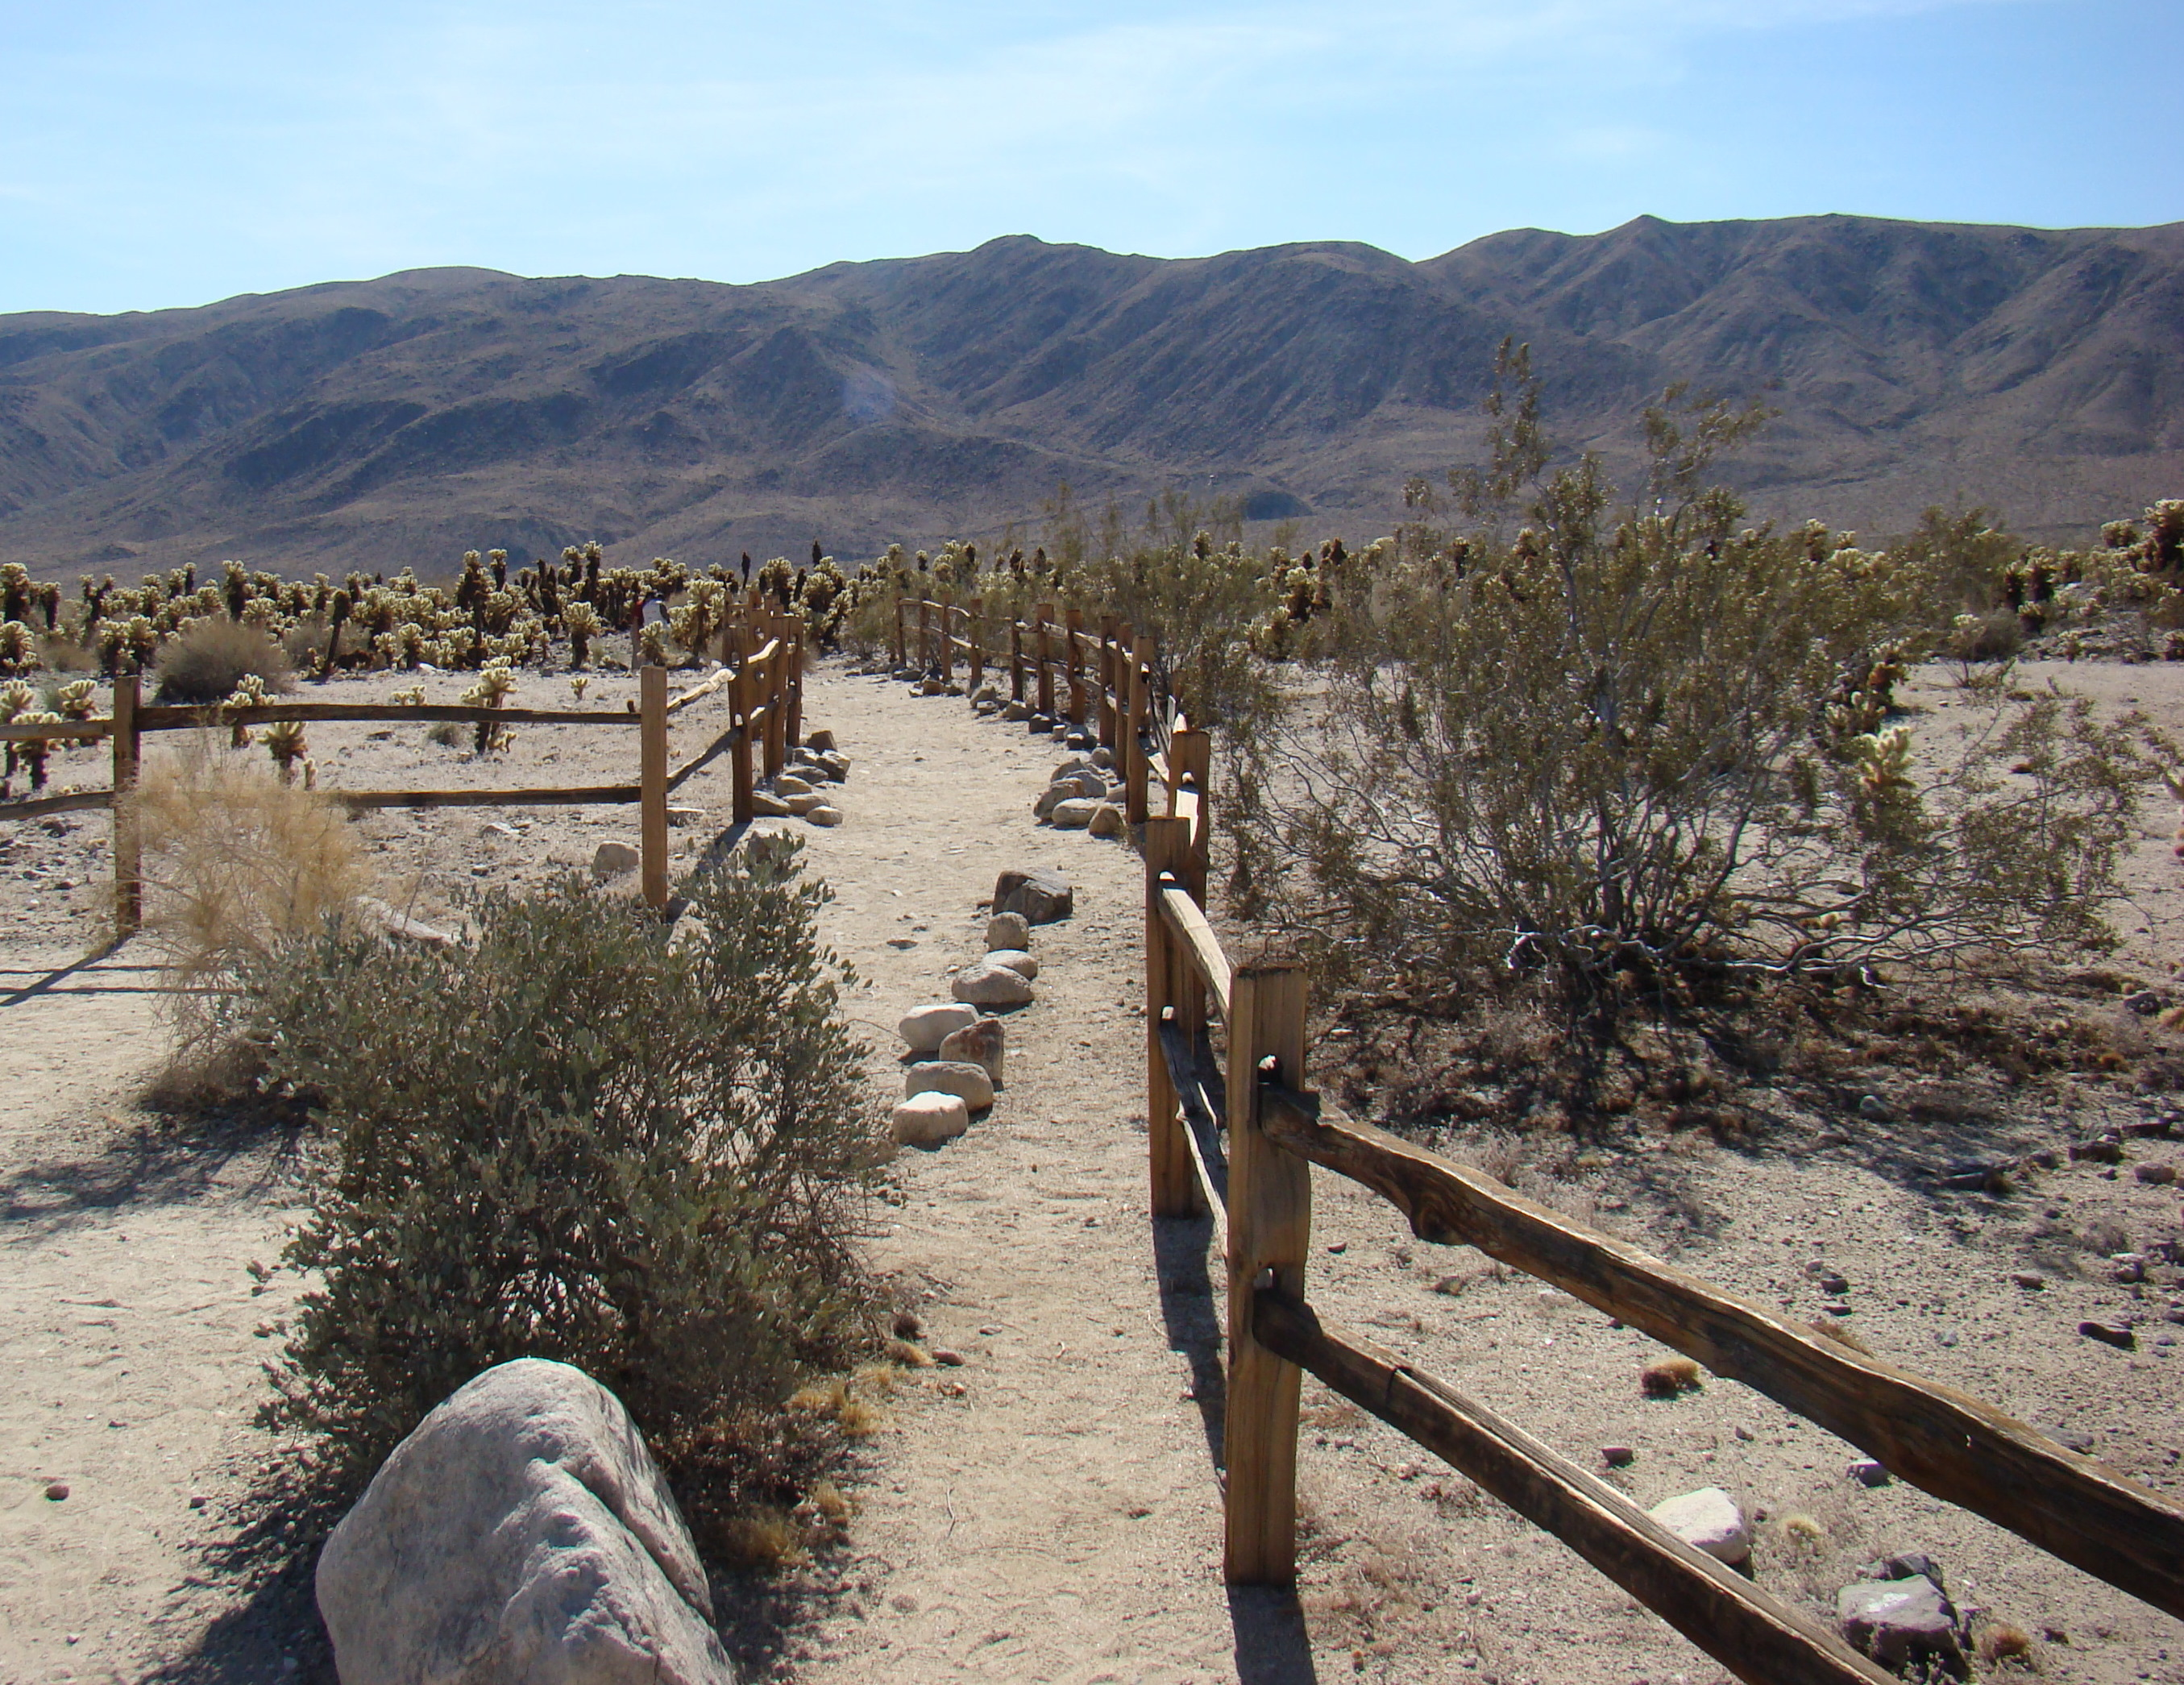 File:Cholla Cactus Garden Nature Trail, Joshua Tree National Park.JPG